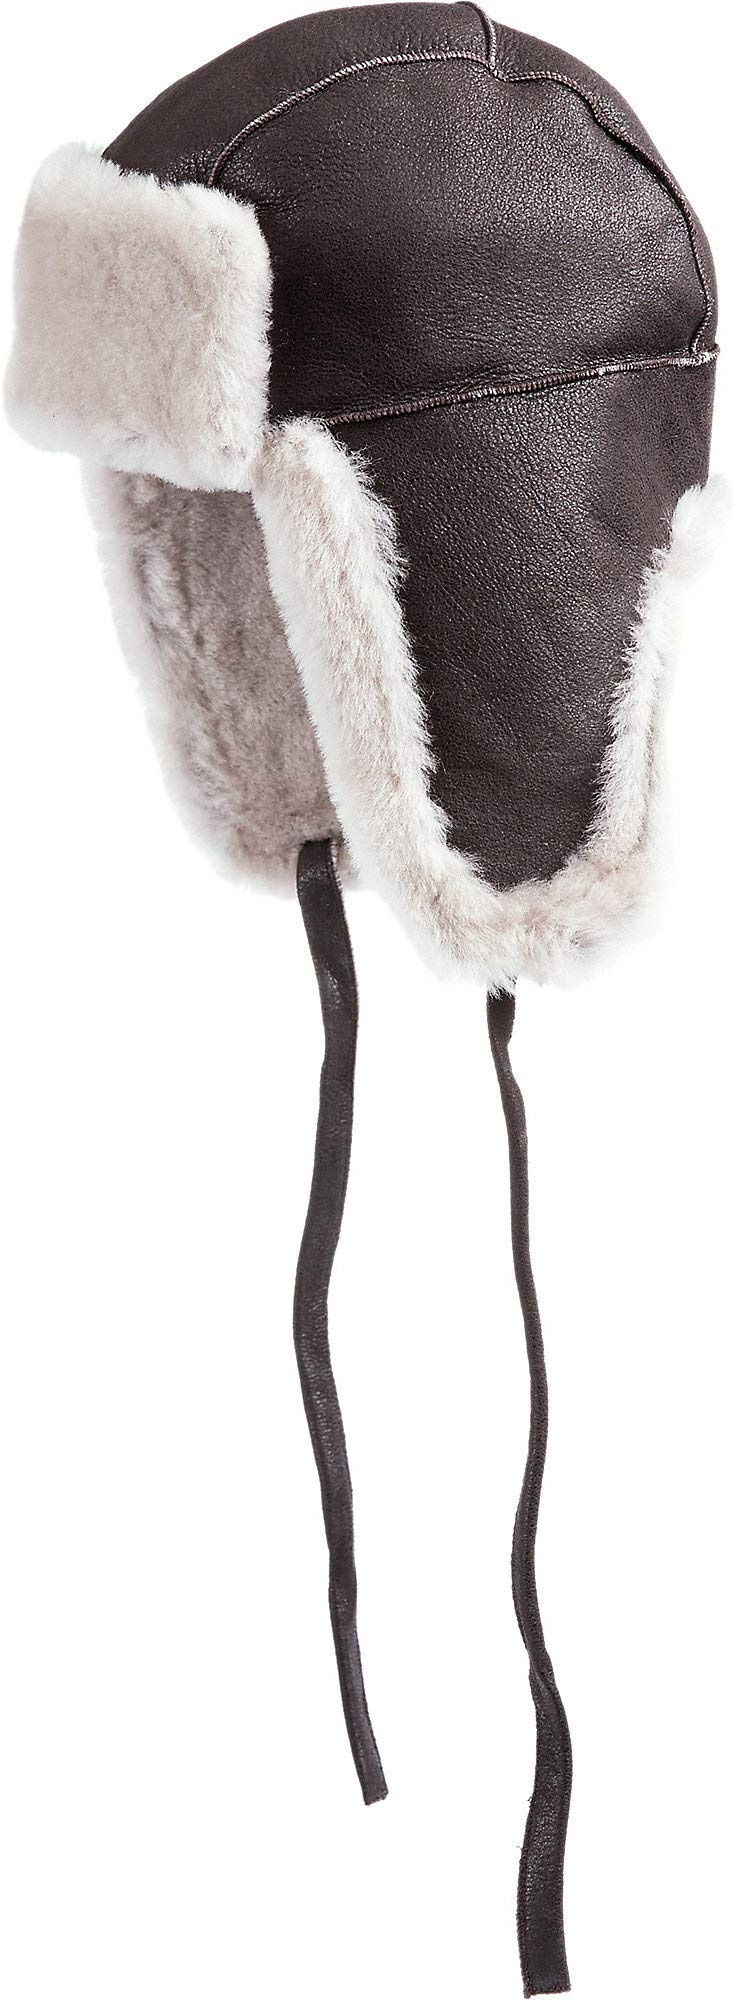 B-3 Sheepskin Aviator Hat Dark Brown/Cream